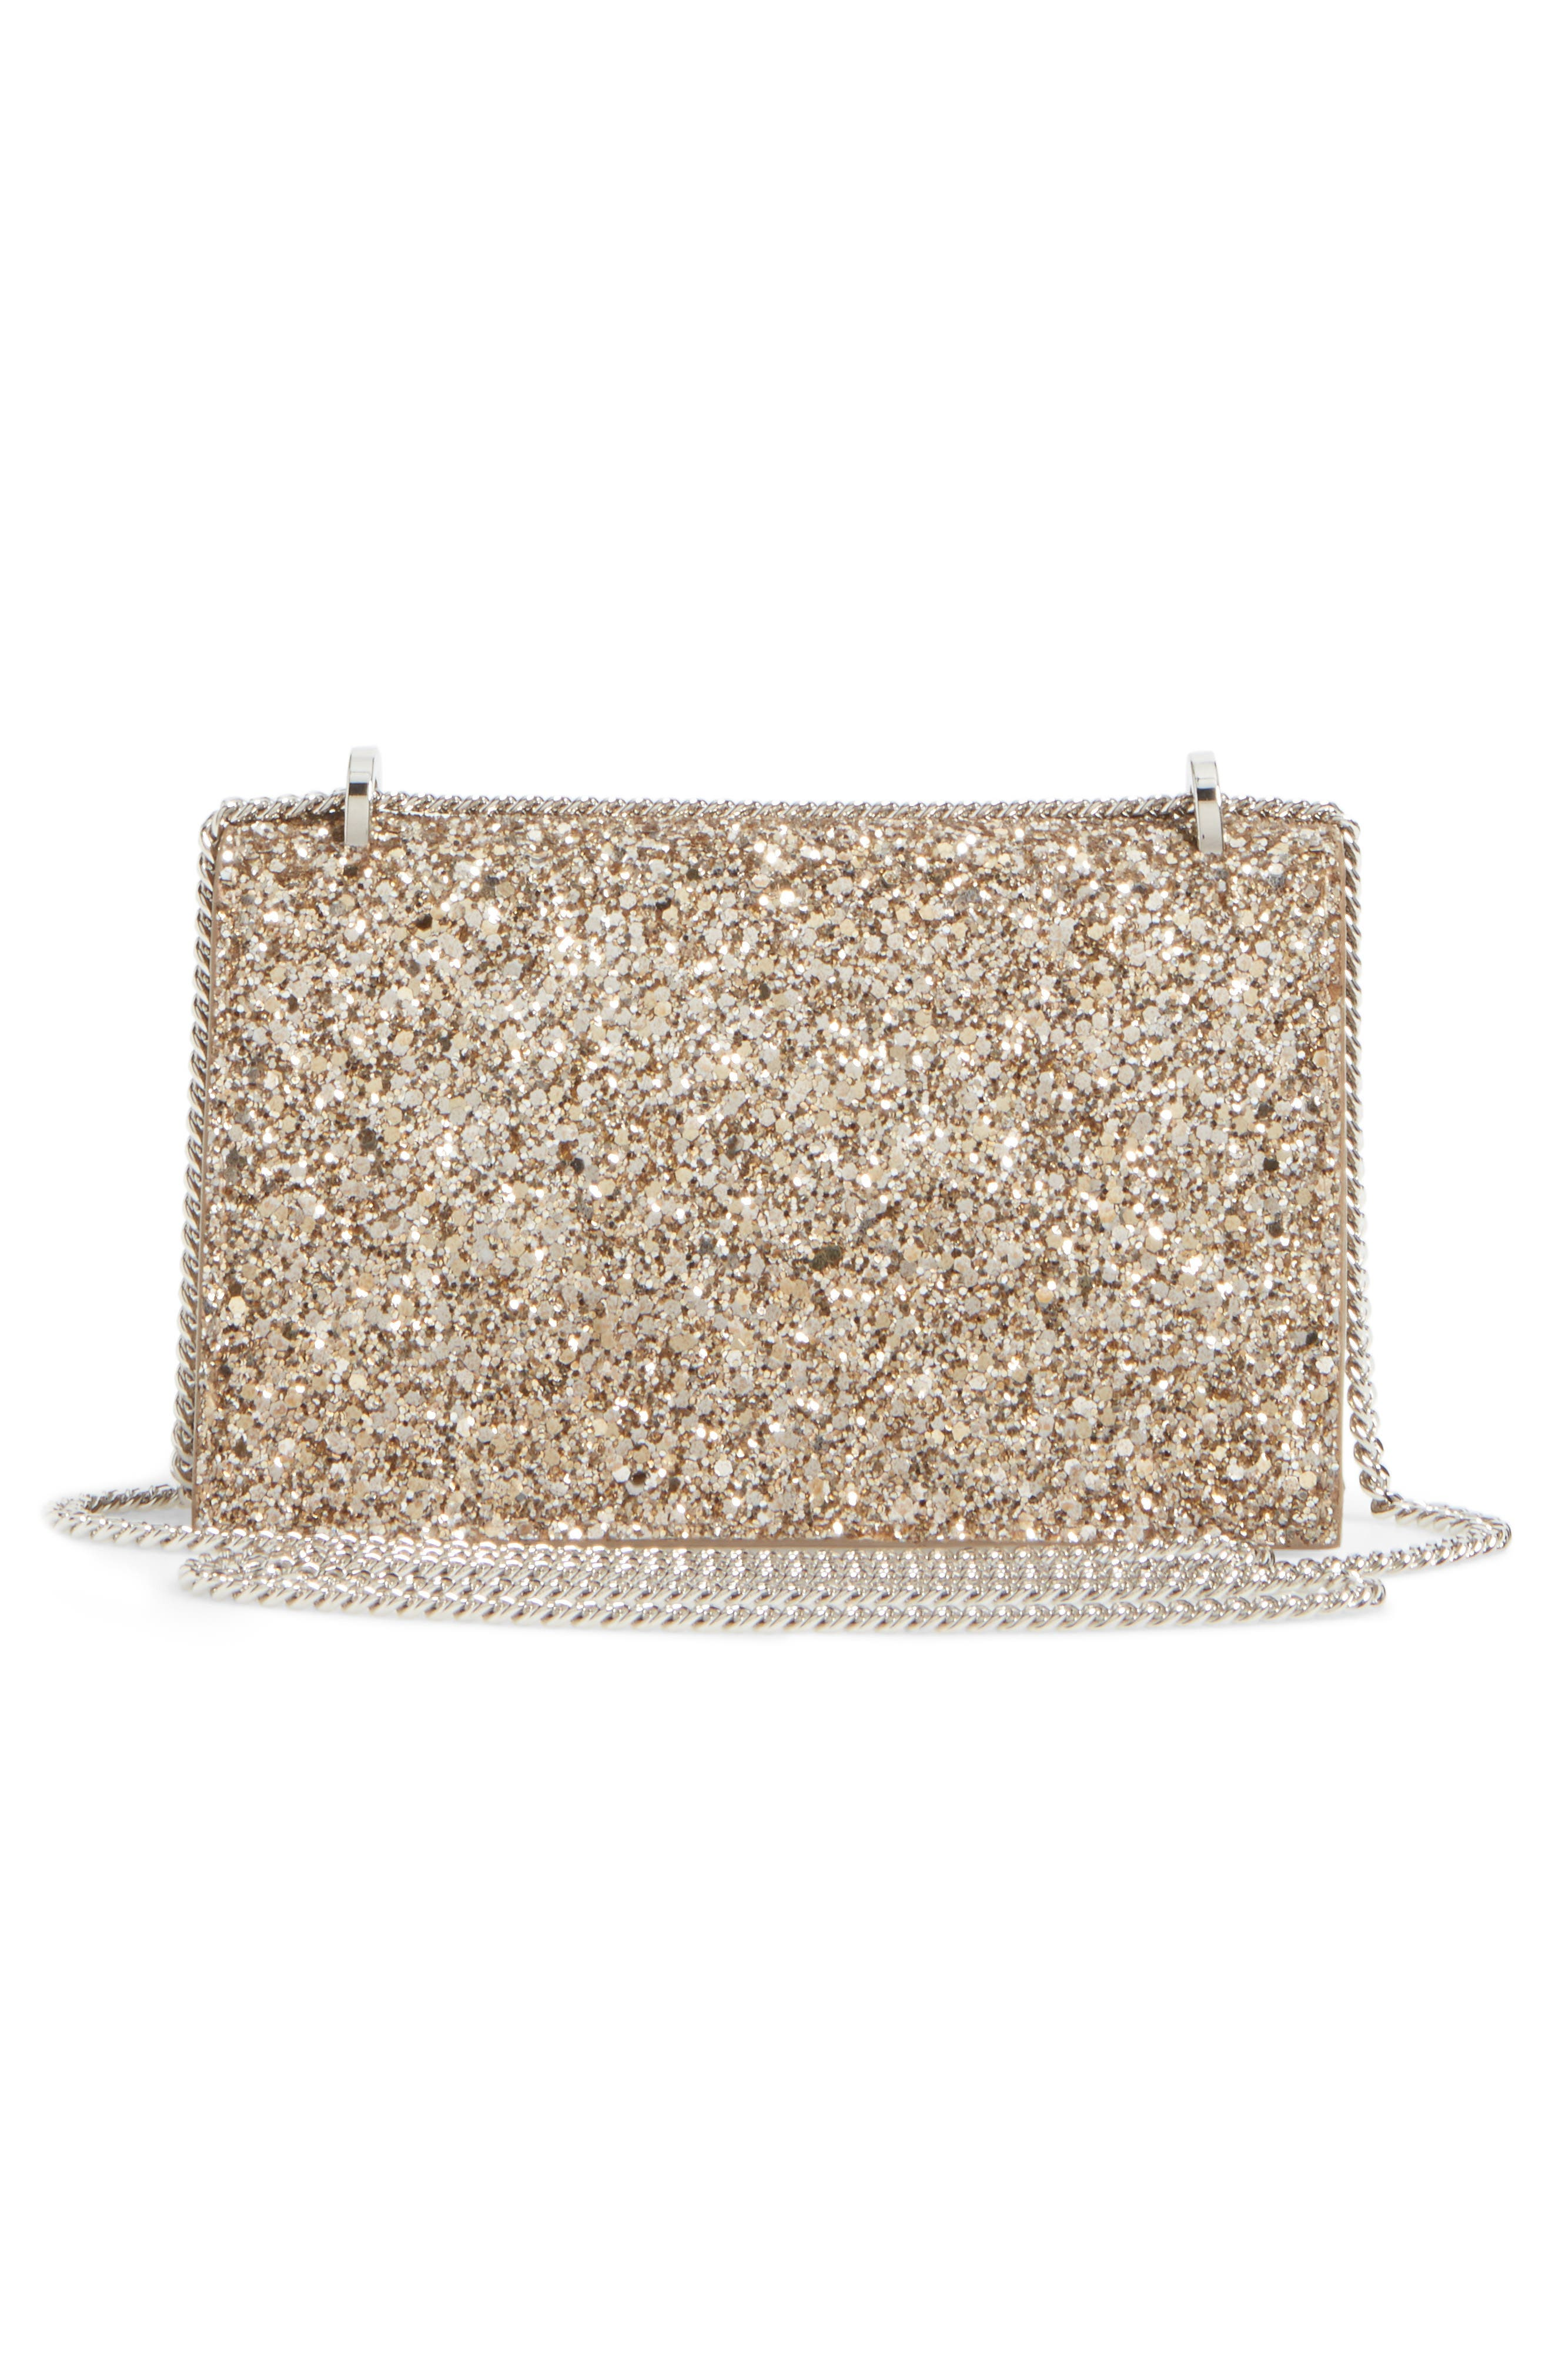 Alternate Image 3  - Jimmy Choo Finley Shadow Glitter Shoulder Bag